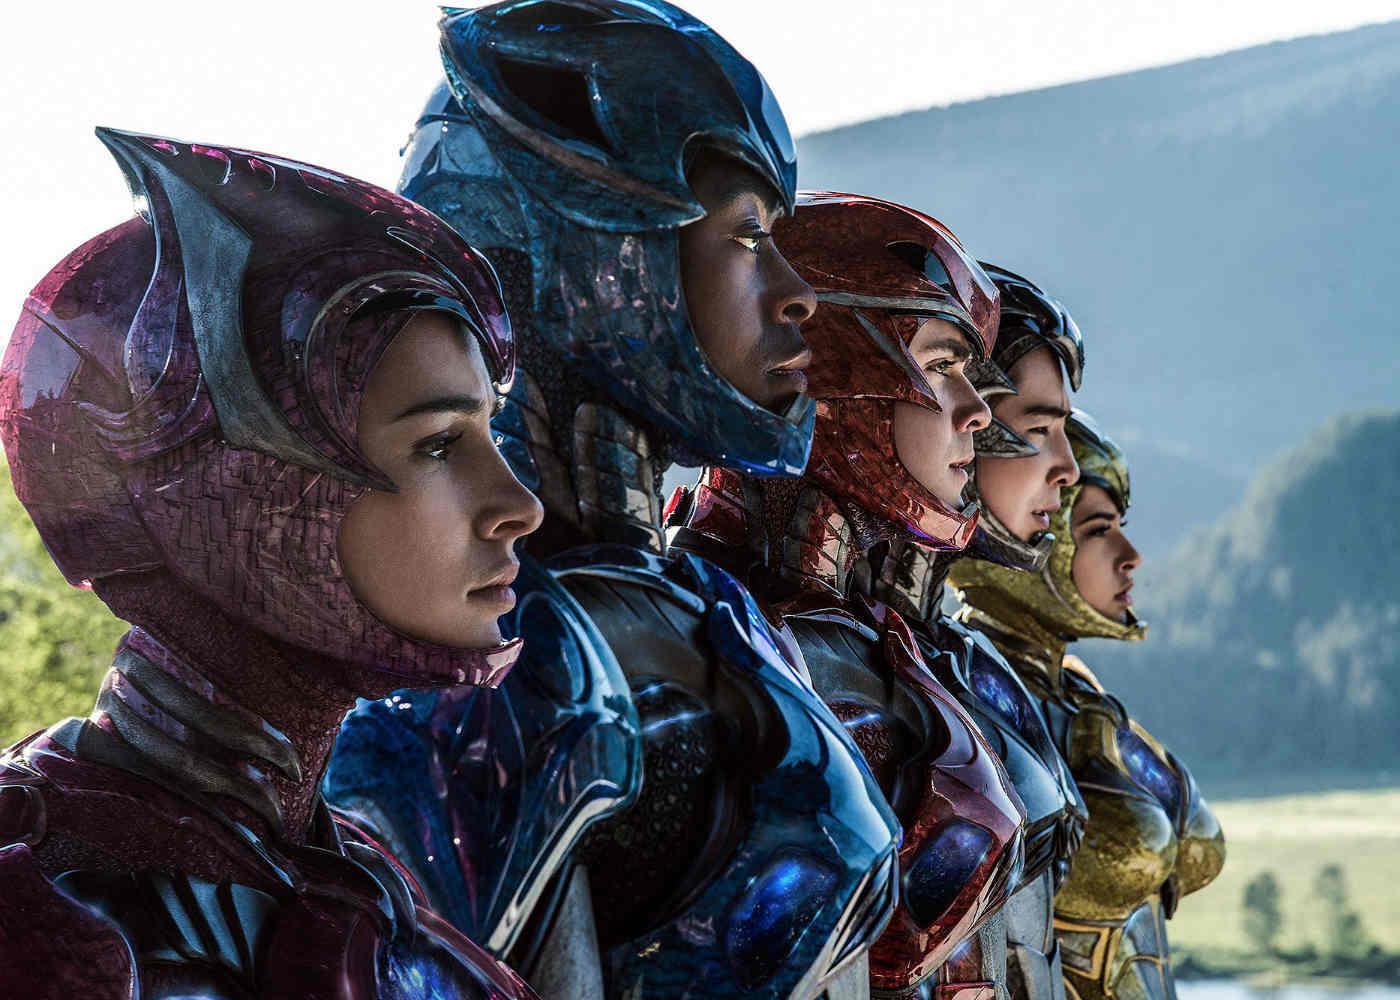 No More Morphin'? Power Rangers Sequel Might Not Happen